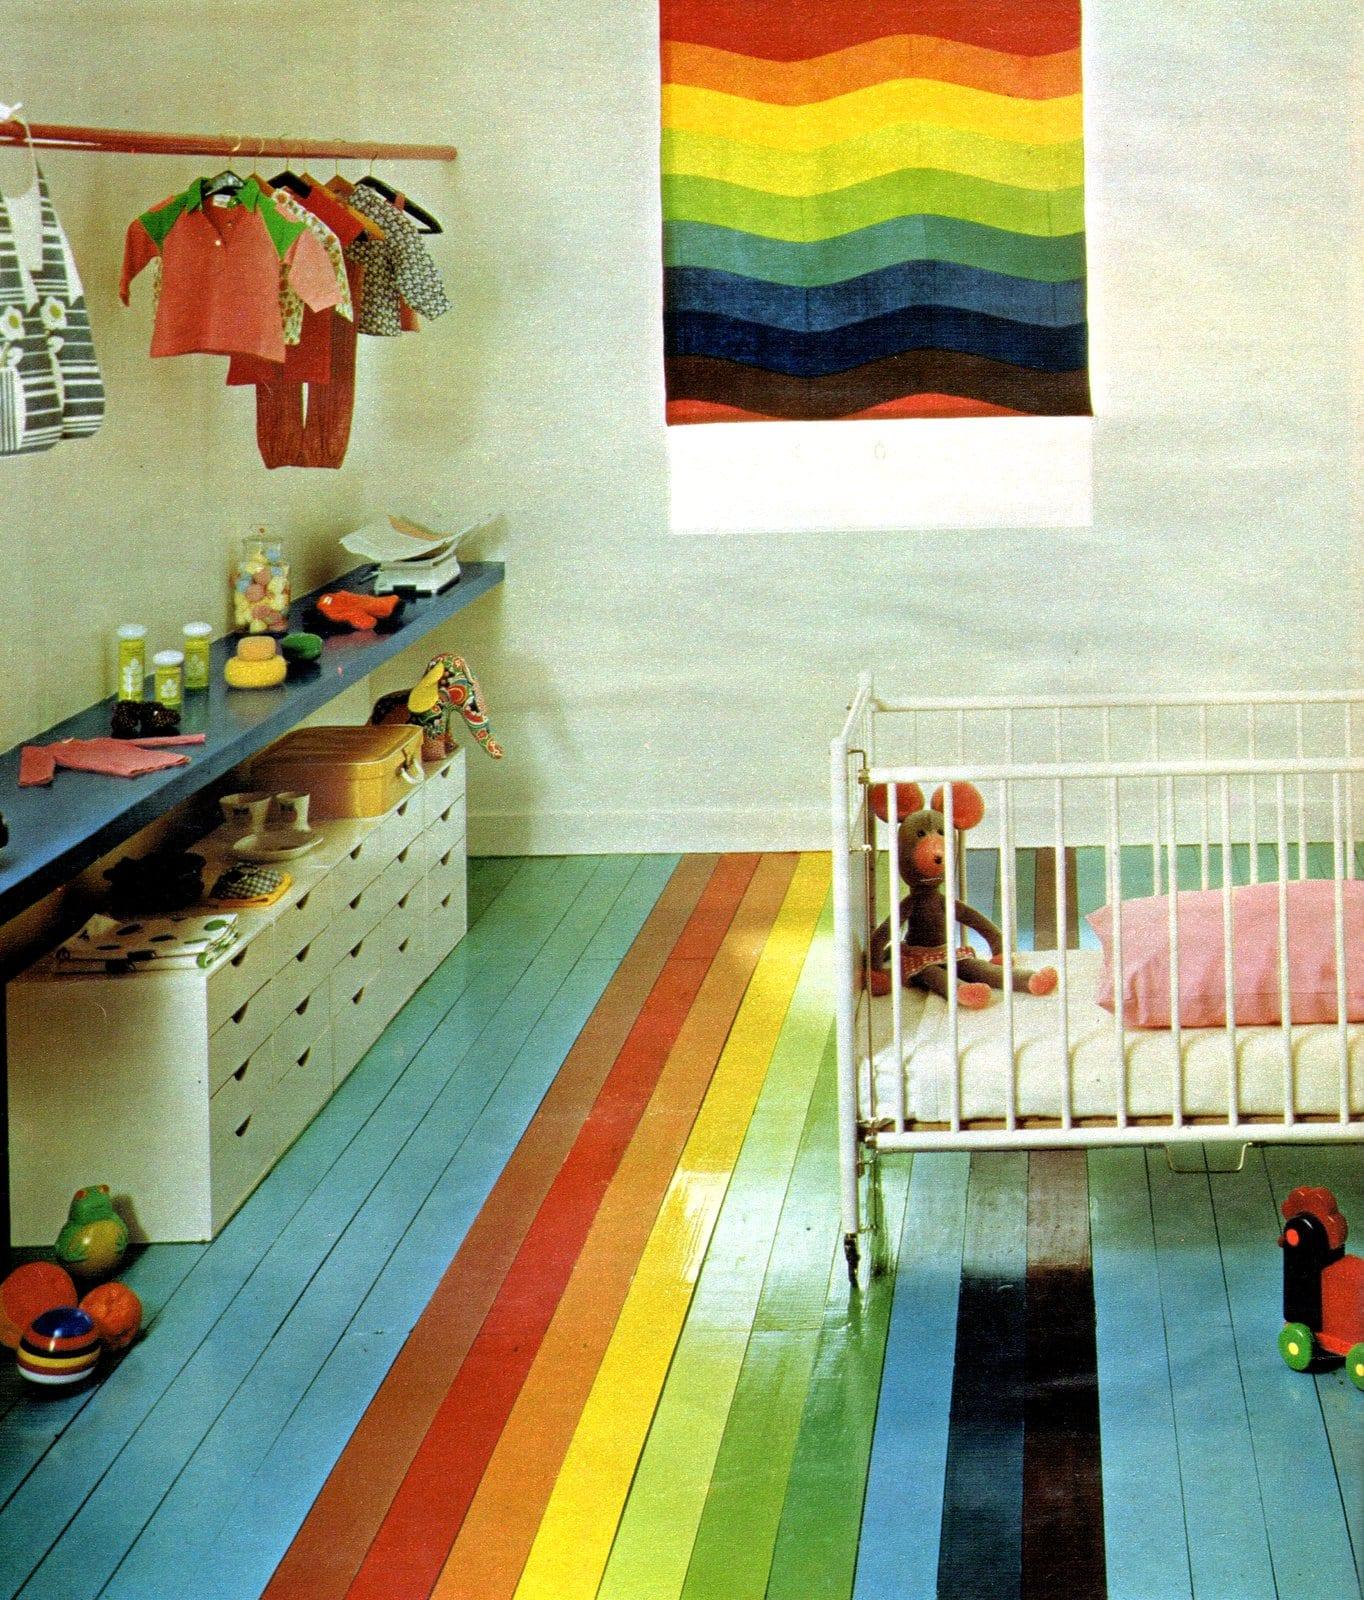 Crayon box rainbow floor and baby bedroom decor (1972)